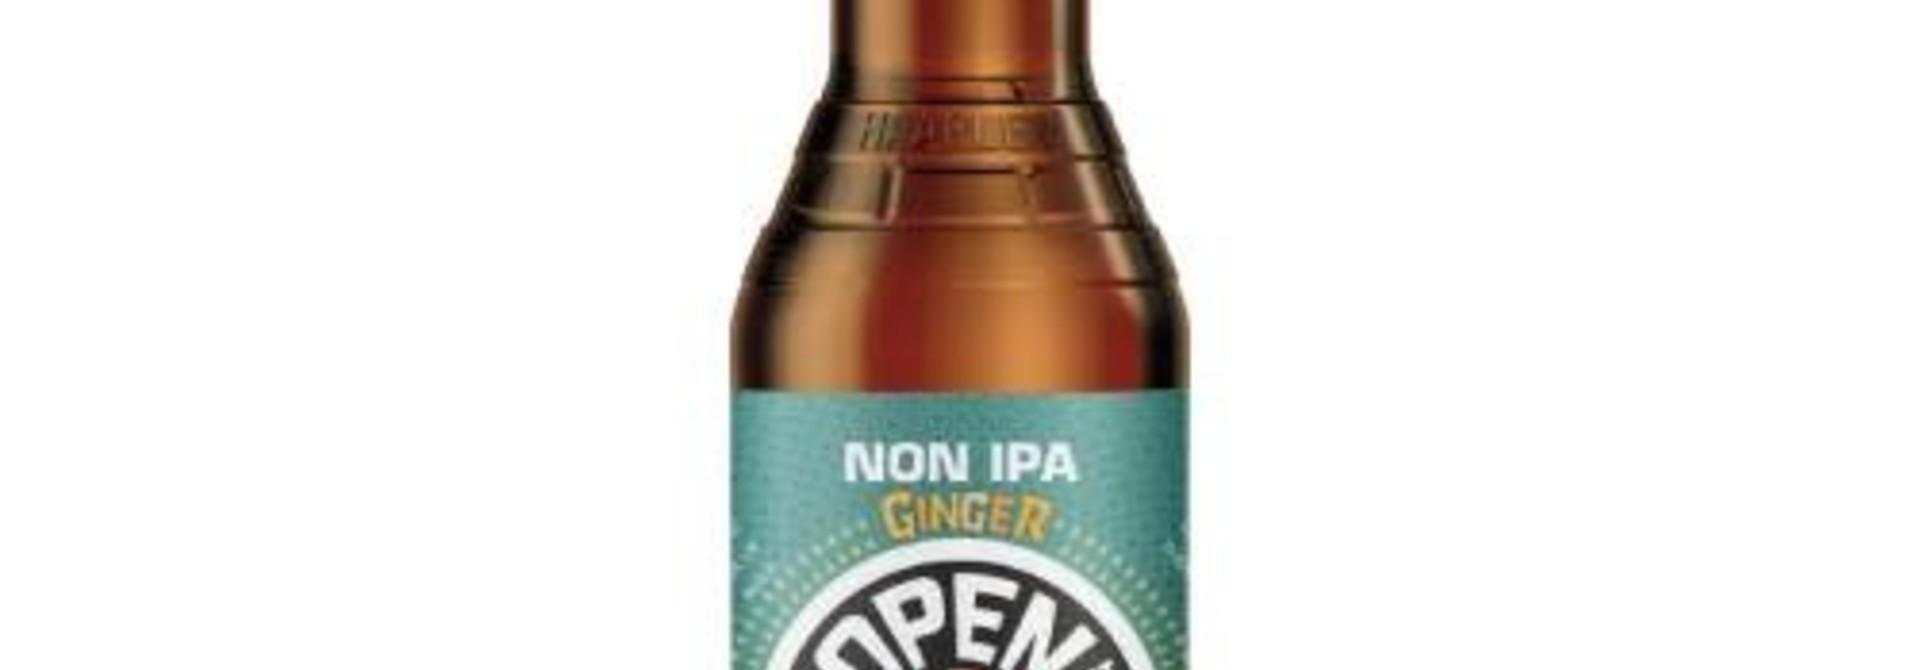 JOPEN - NON IPA GINGER  33CL